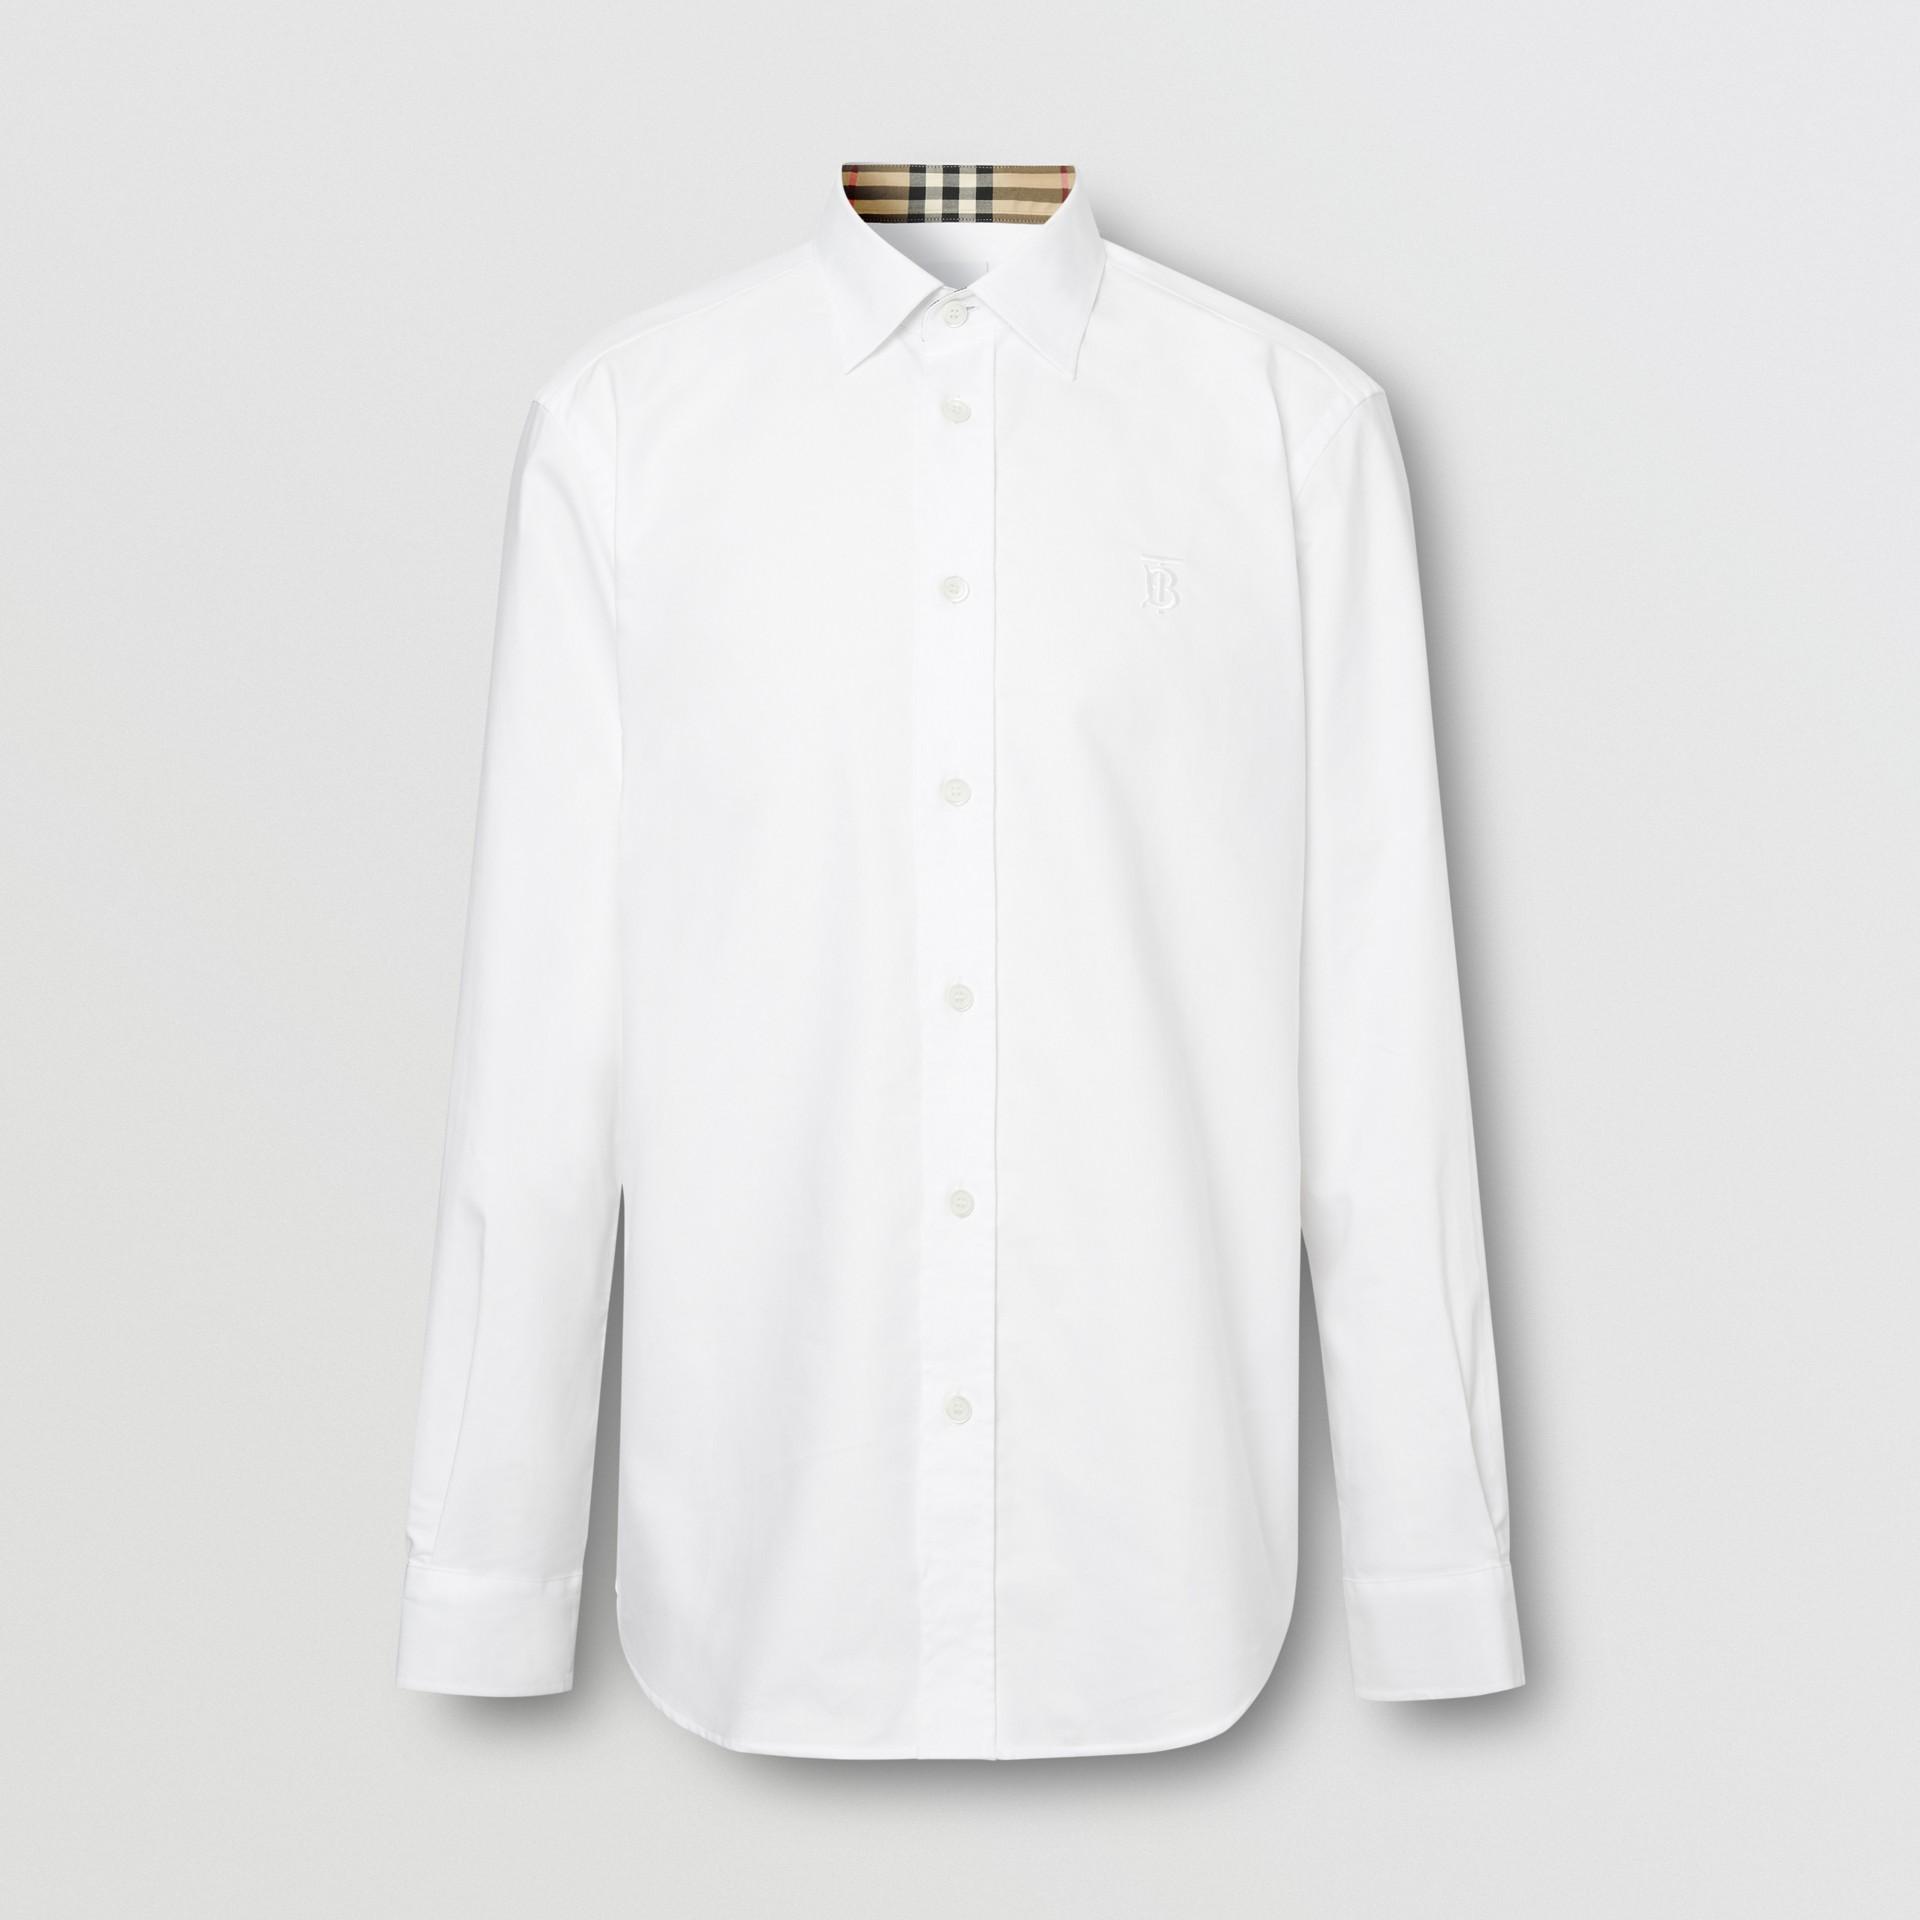 Monogram Motif Cotton Oxford Shirt in White - Men | Burberry Hong Kong S.A.R - gallery image 3